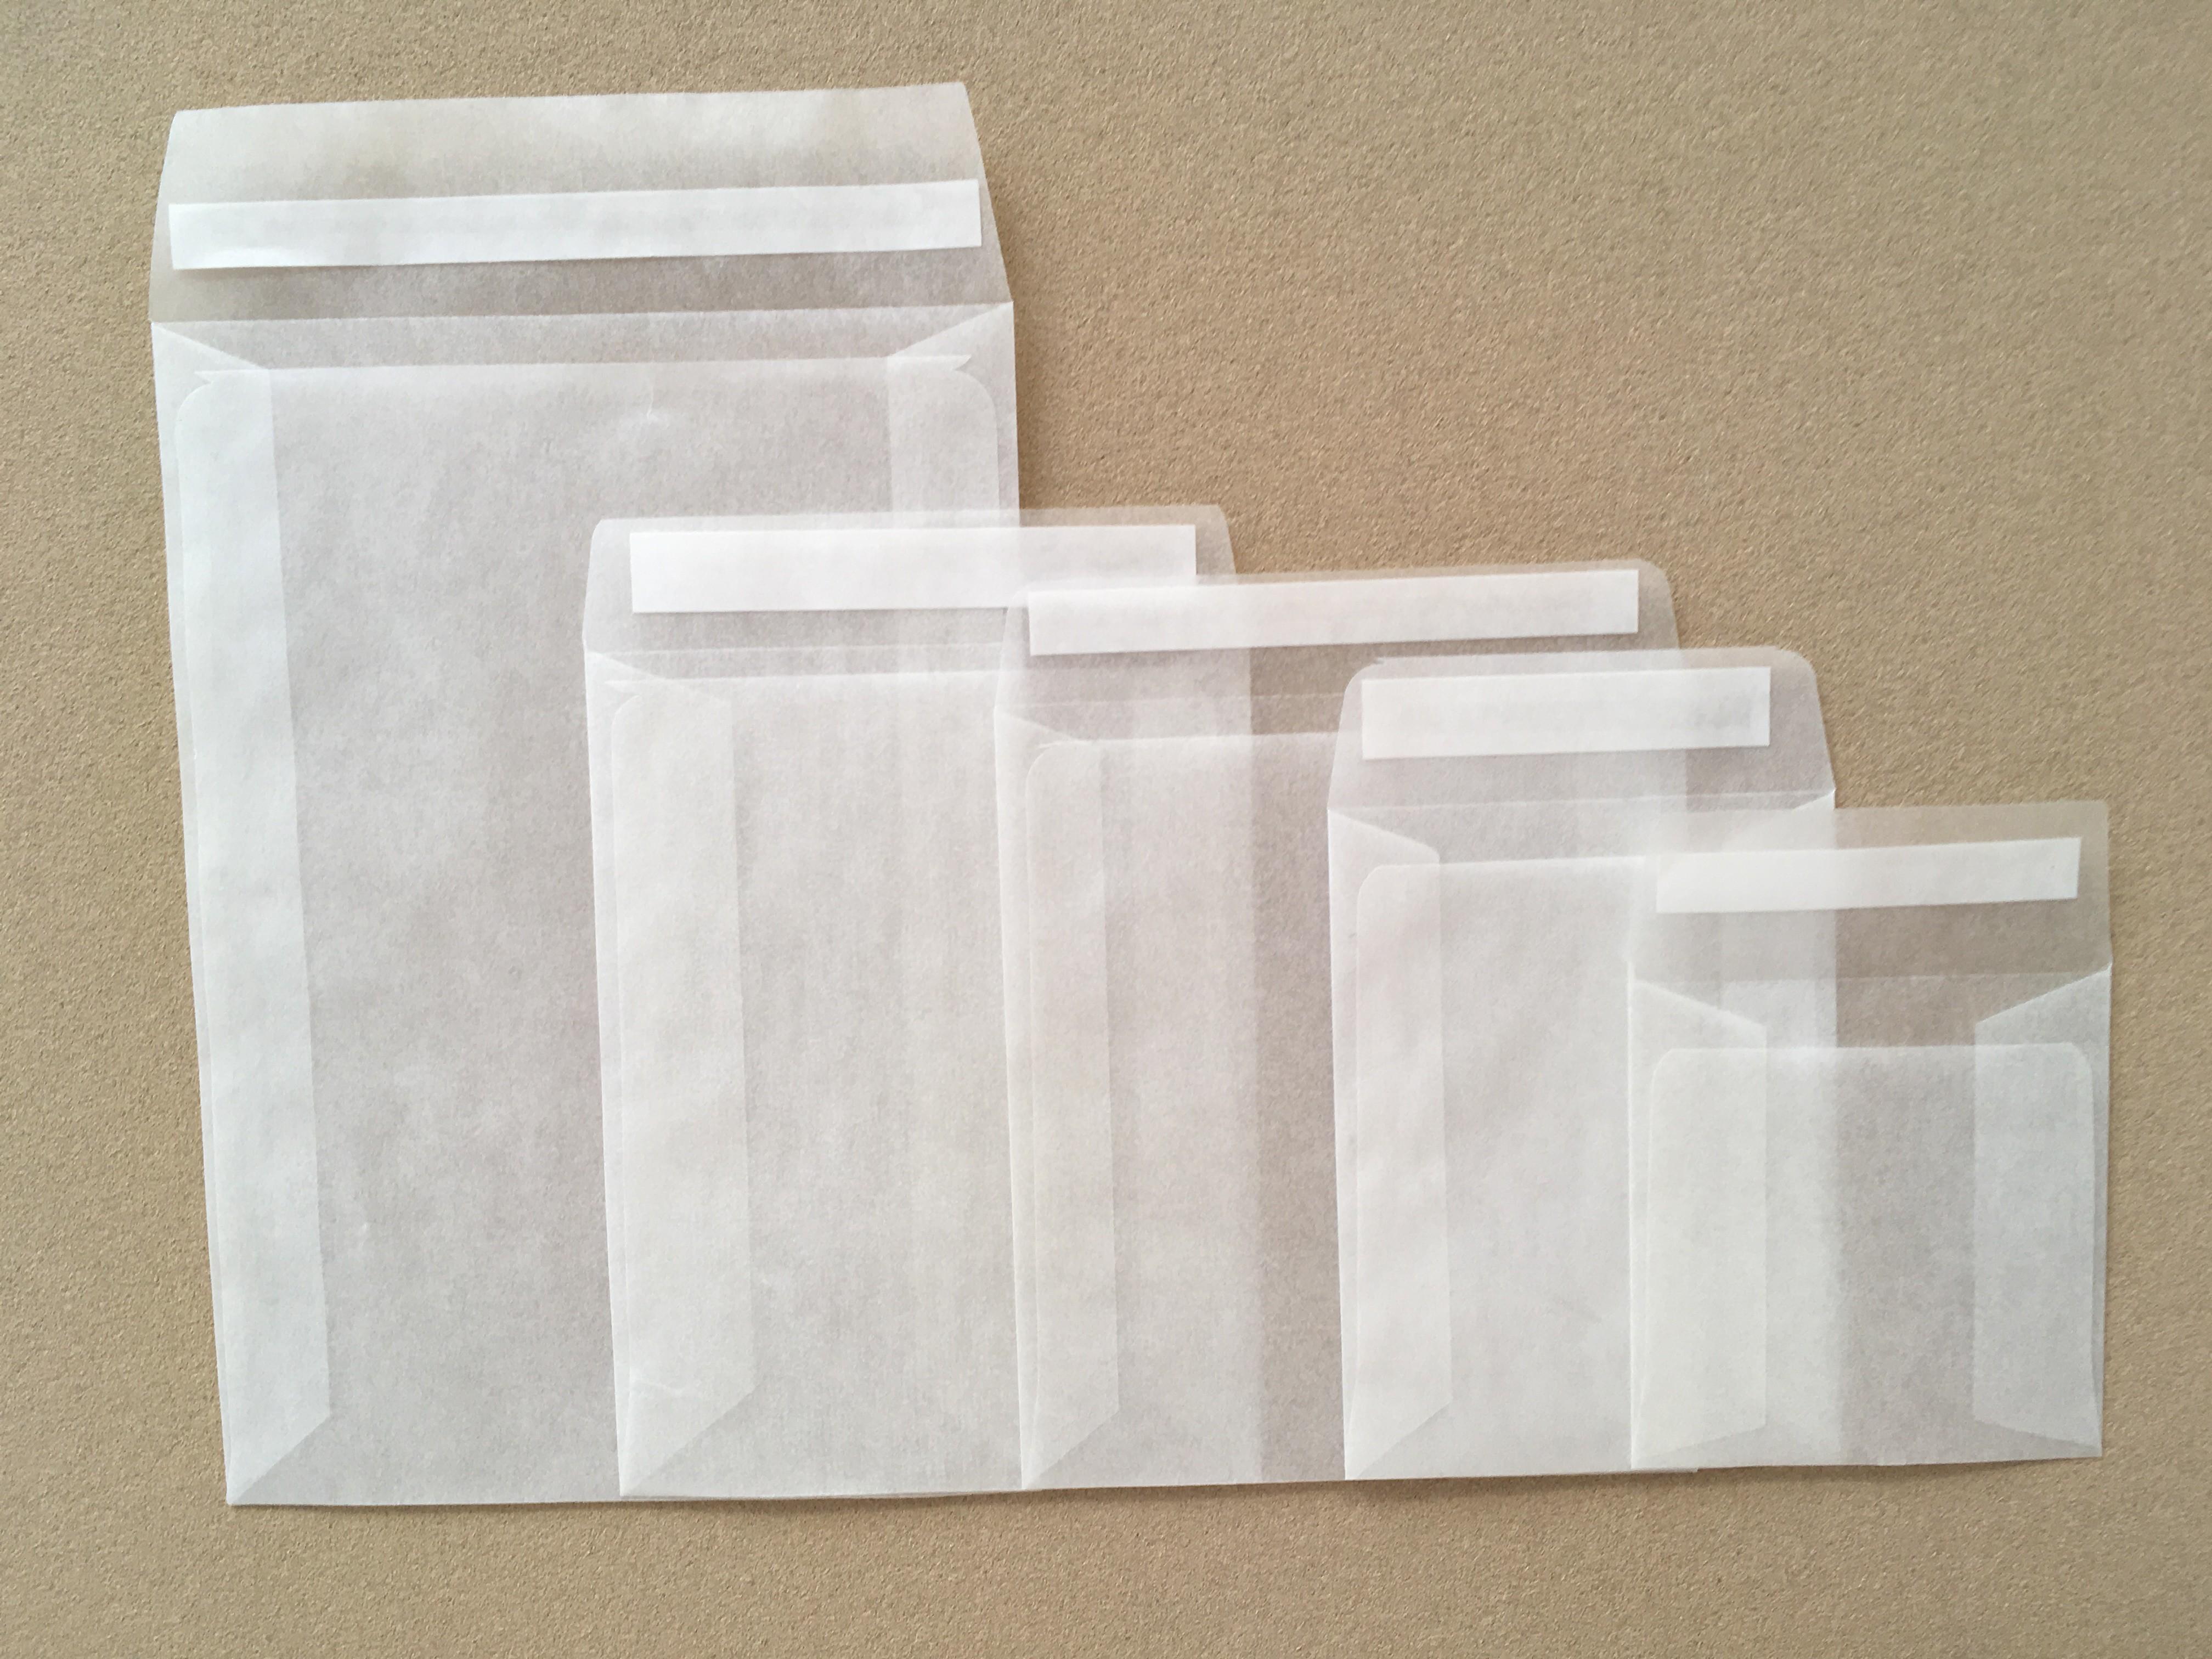 92mm x 68mm Glassine Peel and Seal Envelope Bags [Pack of 1000]